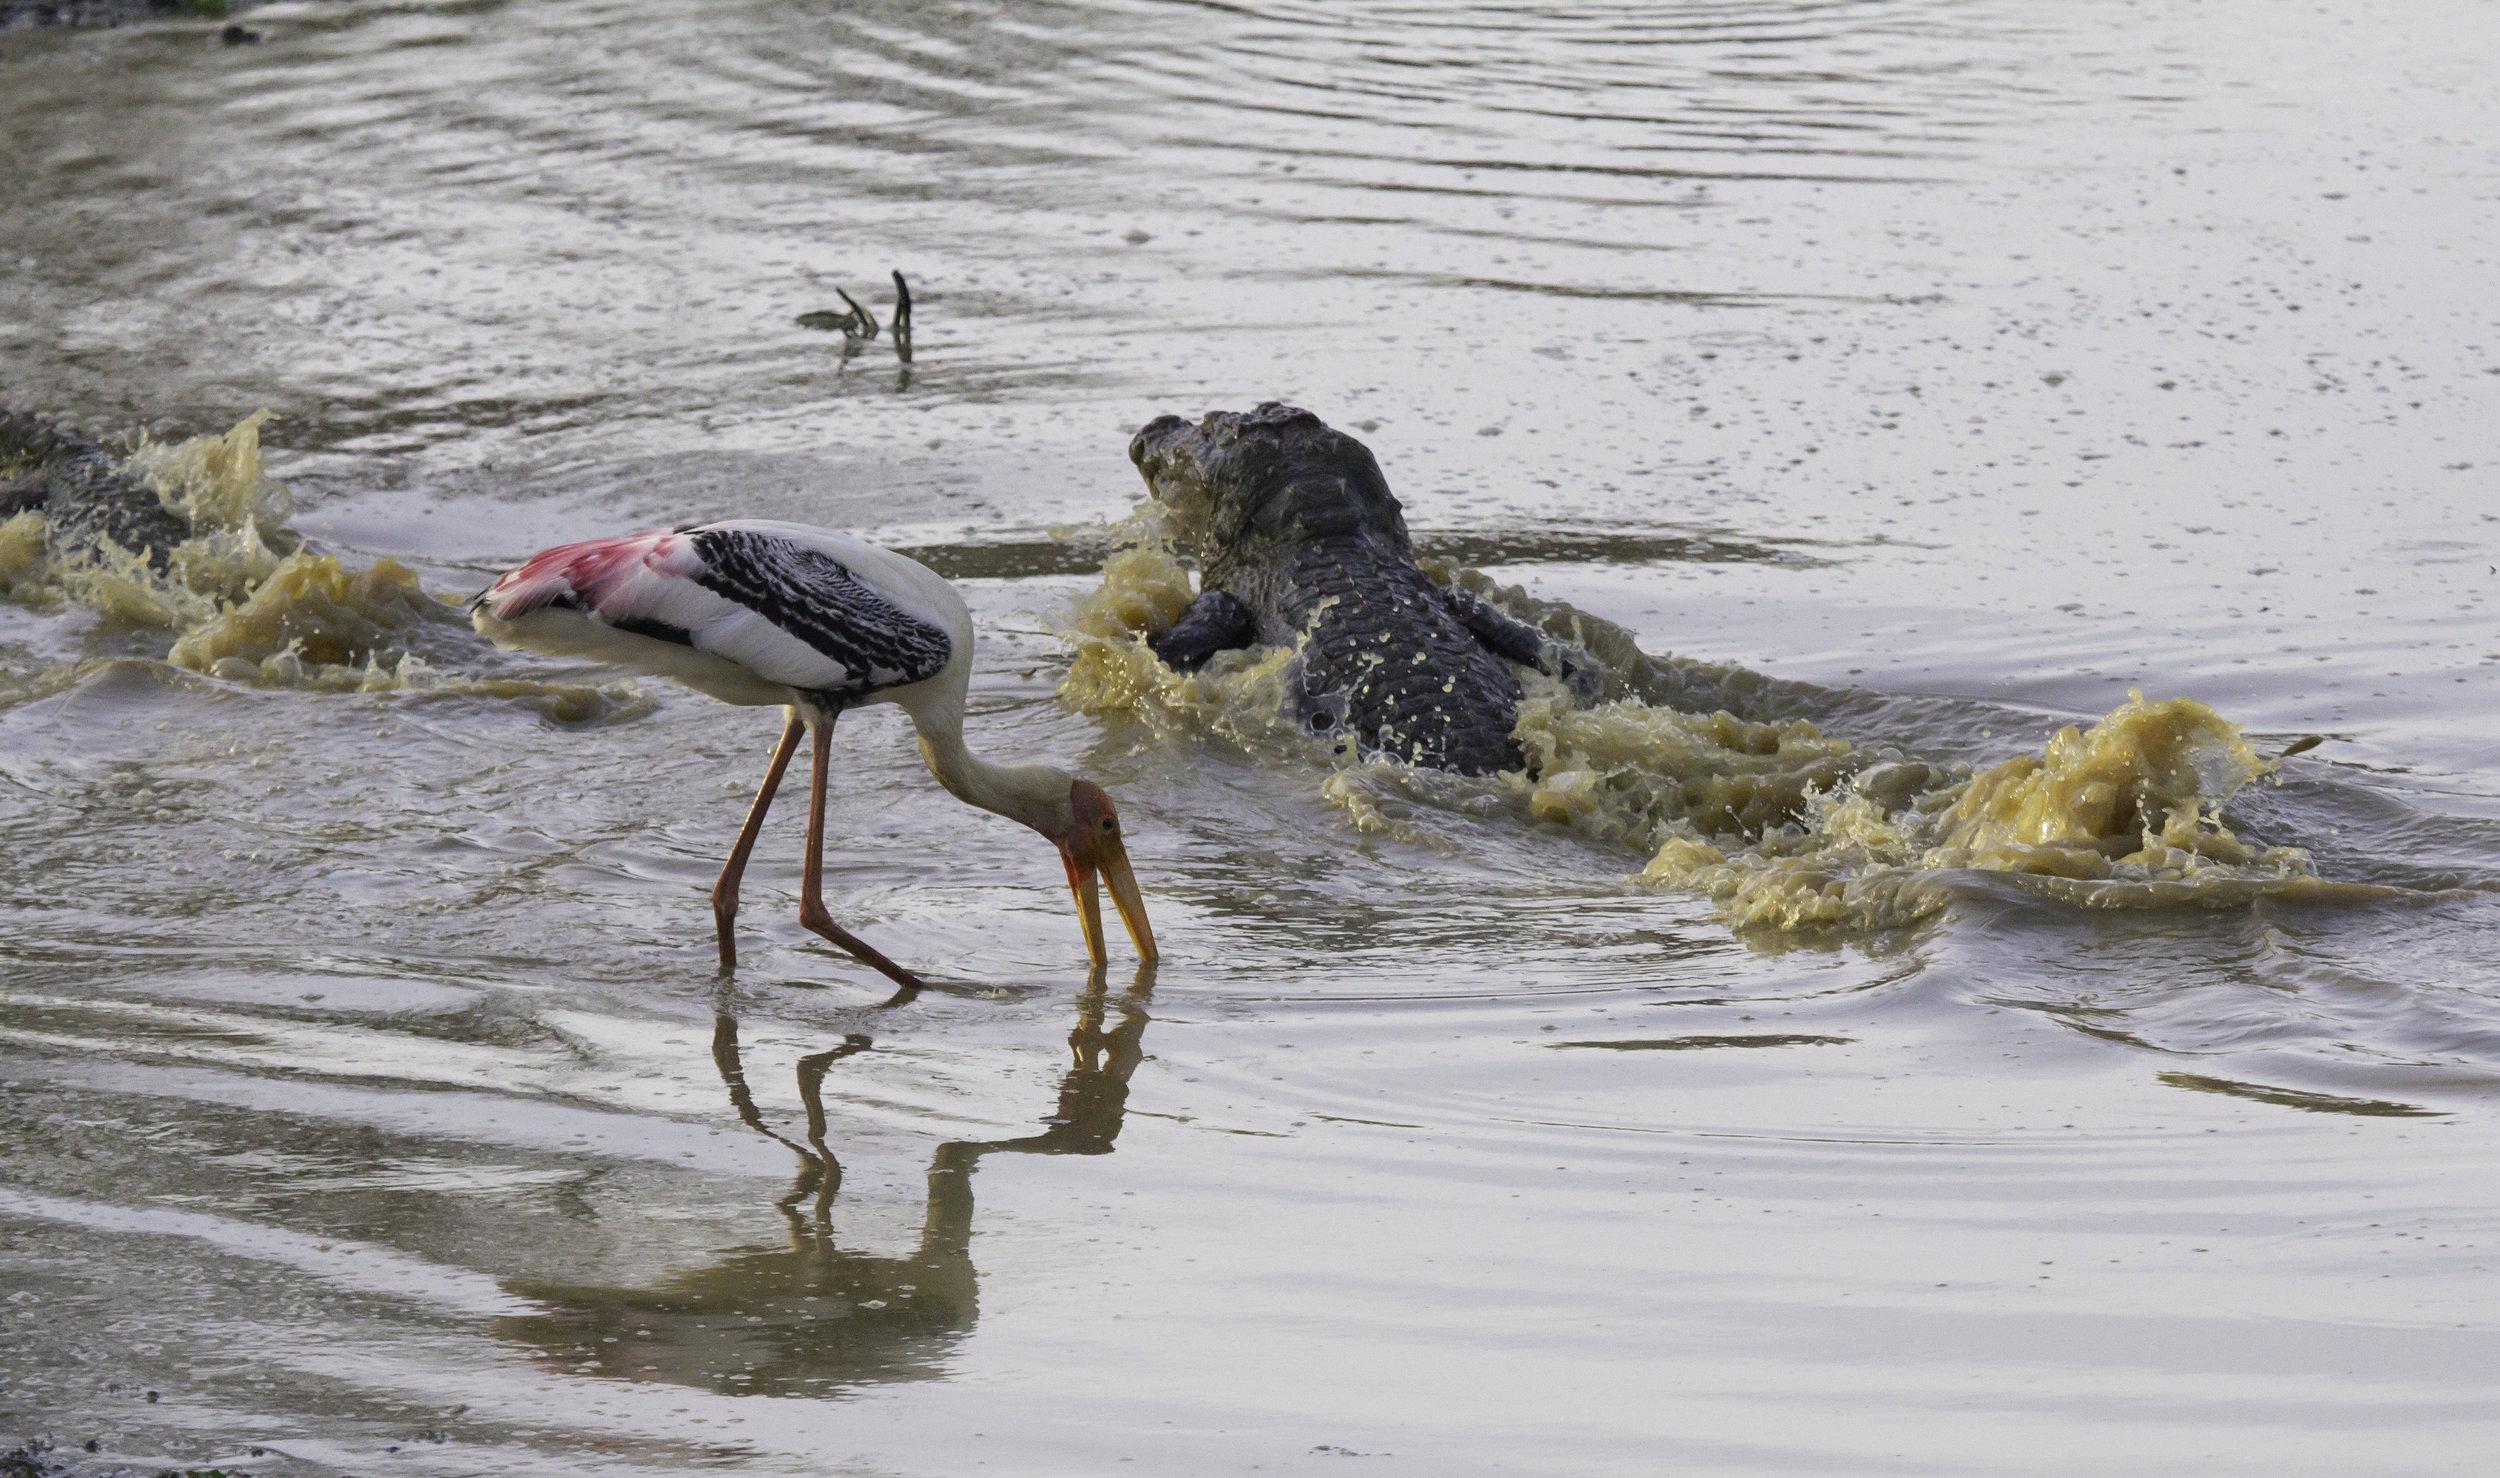 Stork and Croc.jpg